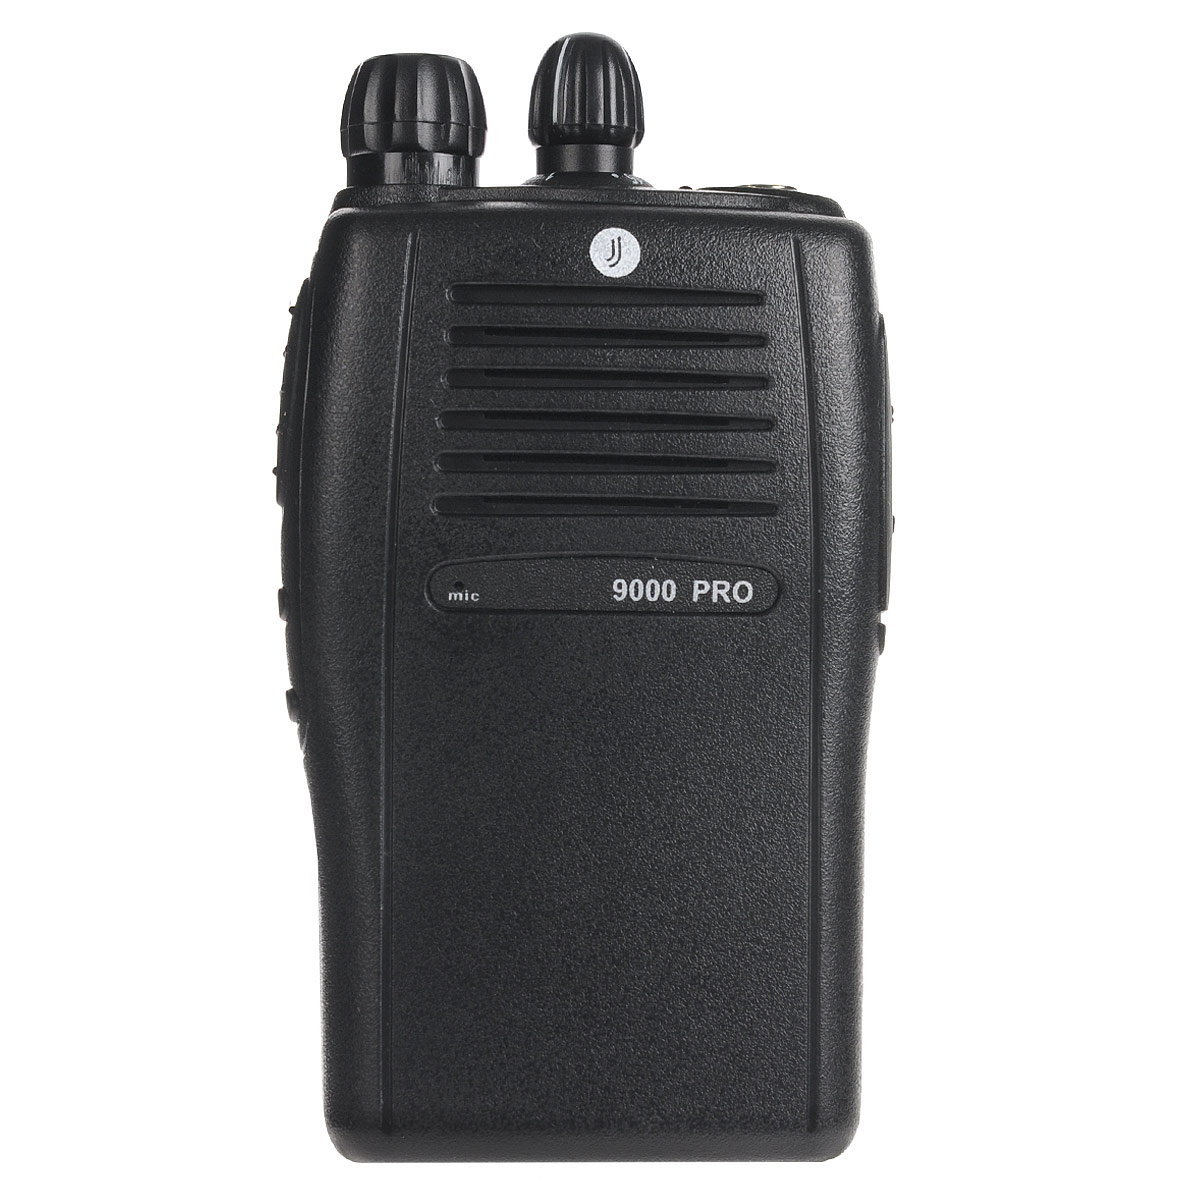 Радиостанция JJ-Connect 9000 PRO gps навигатор jj connect 3400w